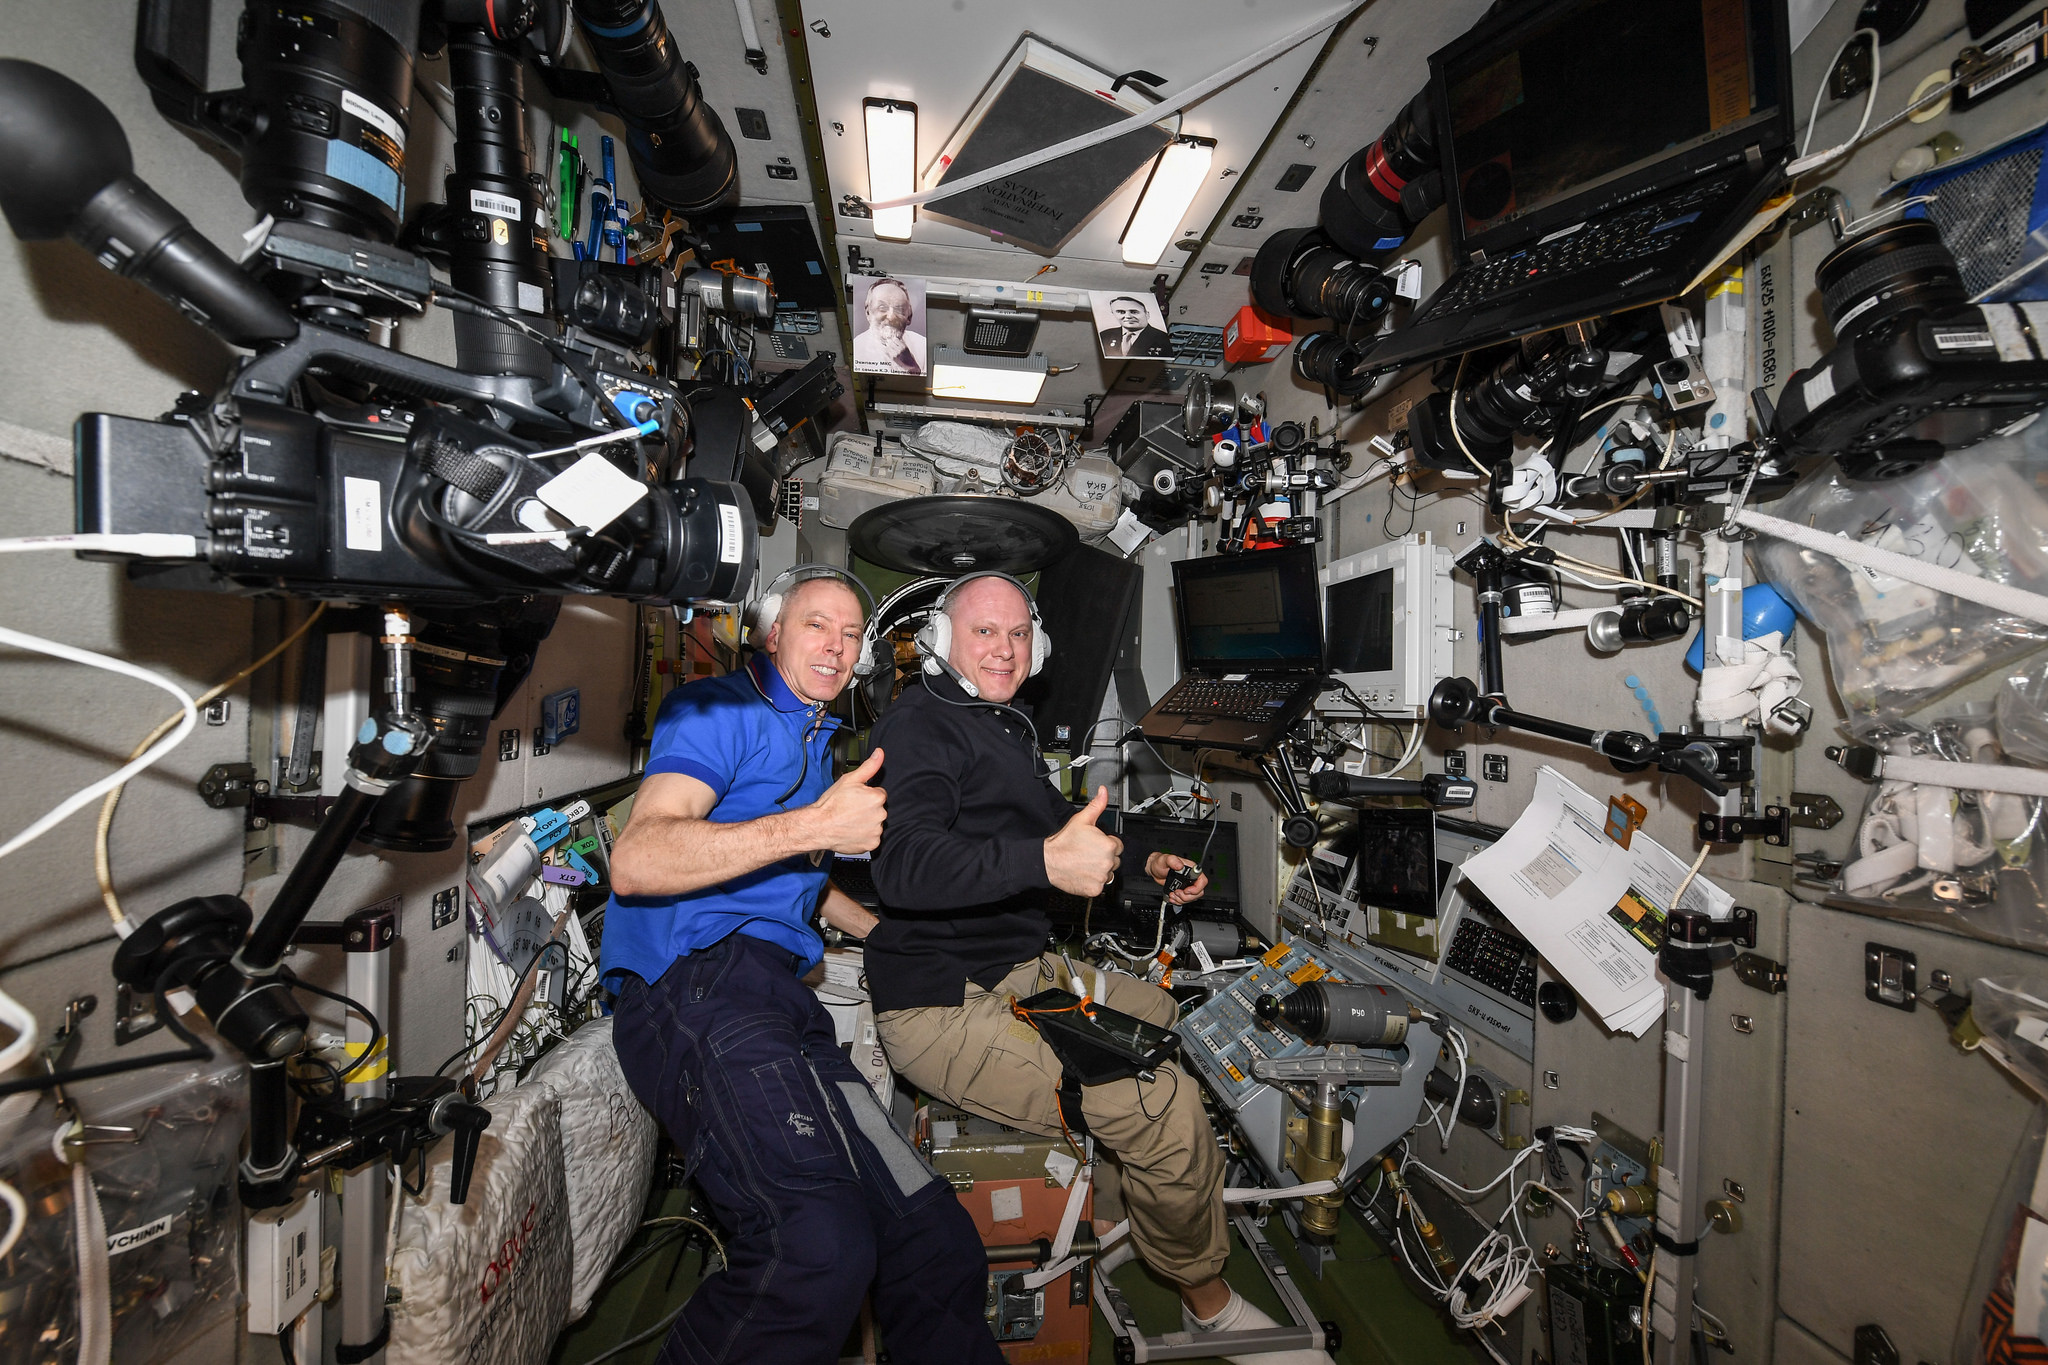 Expedition 56 Commander and NASA astronaut Drew Feustel, left, and Russian cosmonaut Oleg Artemyev of Roscosmos inside the Zvezda service module practicing Soyuz descent procedures several days before landing. Credit: NASA